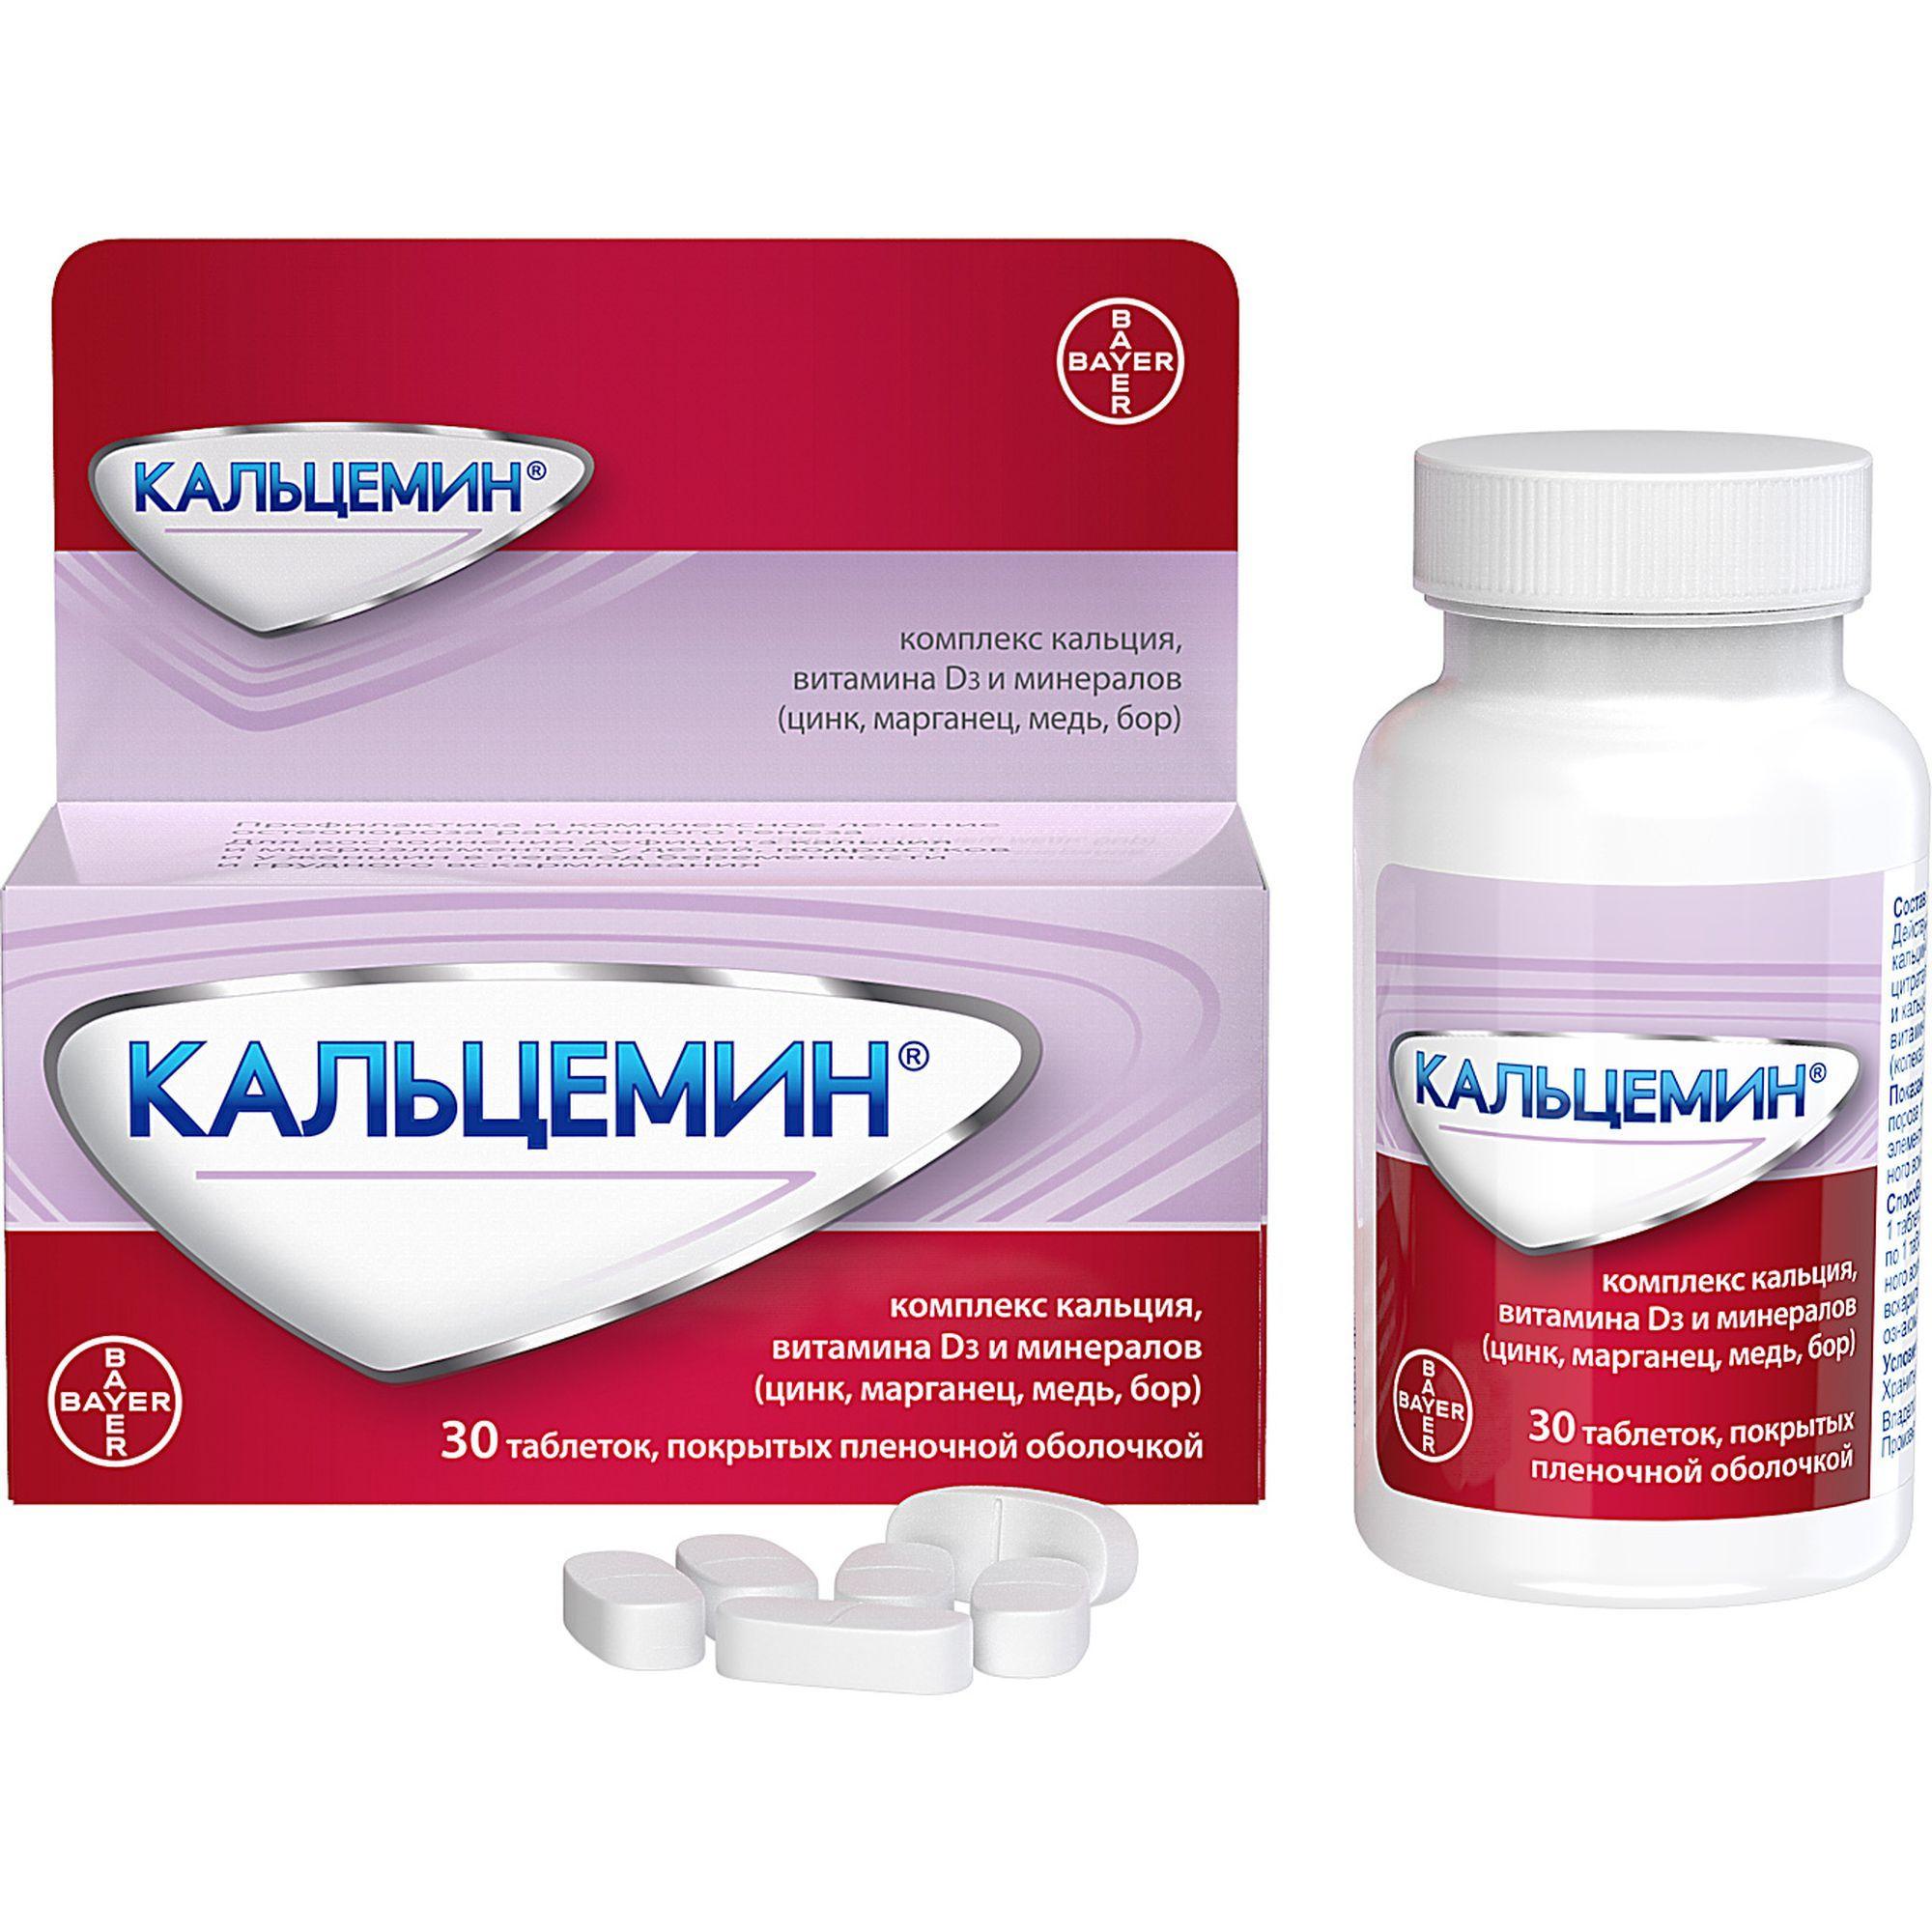 фото упаковки Кальцемин